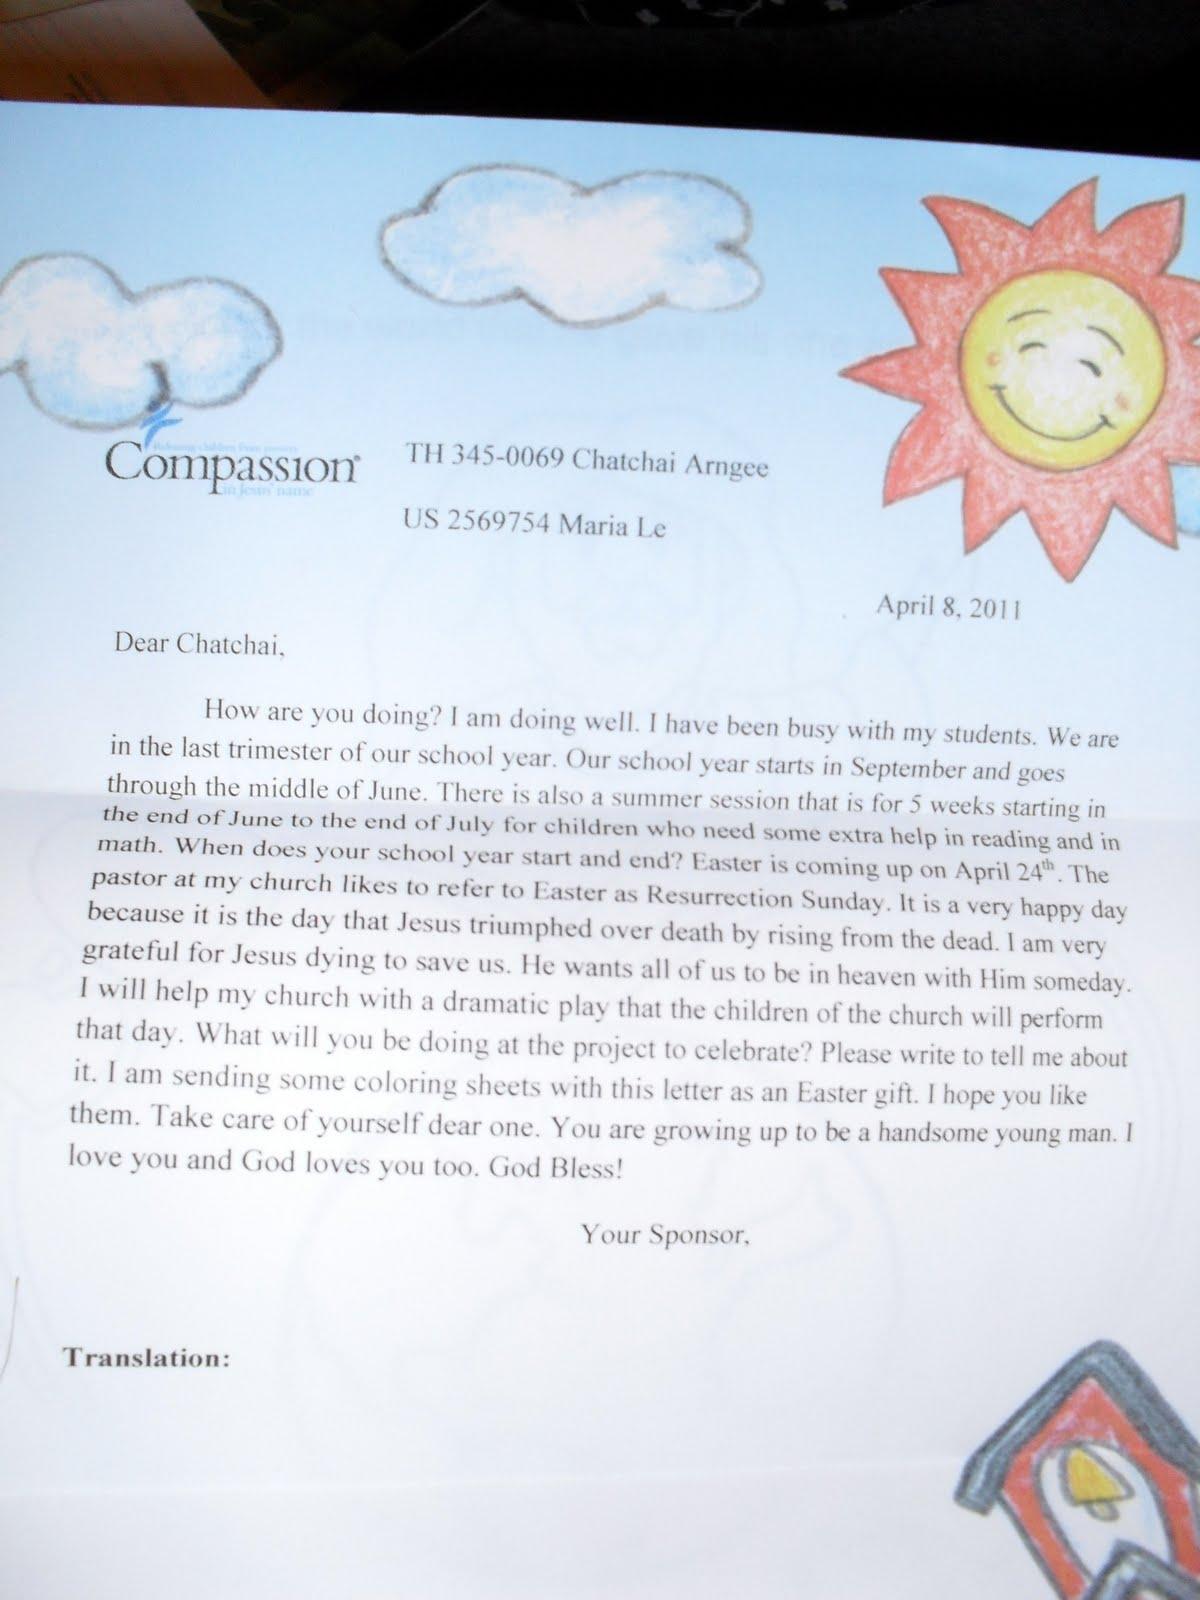 Charity Sponsorship Letter Example – Sponsorship Letters Examples